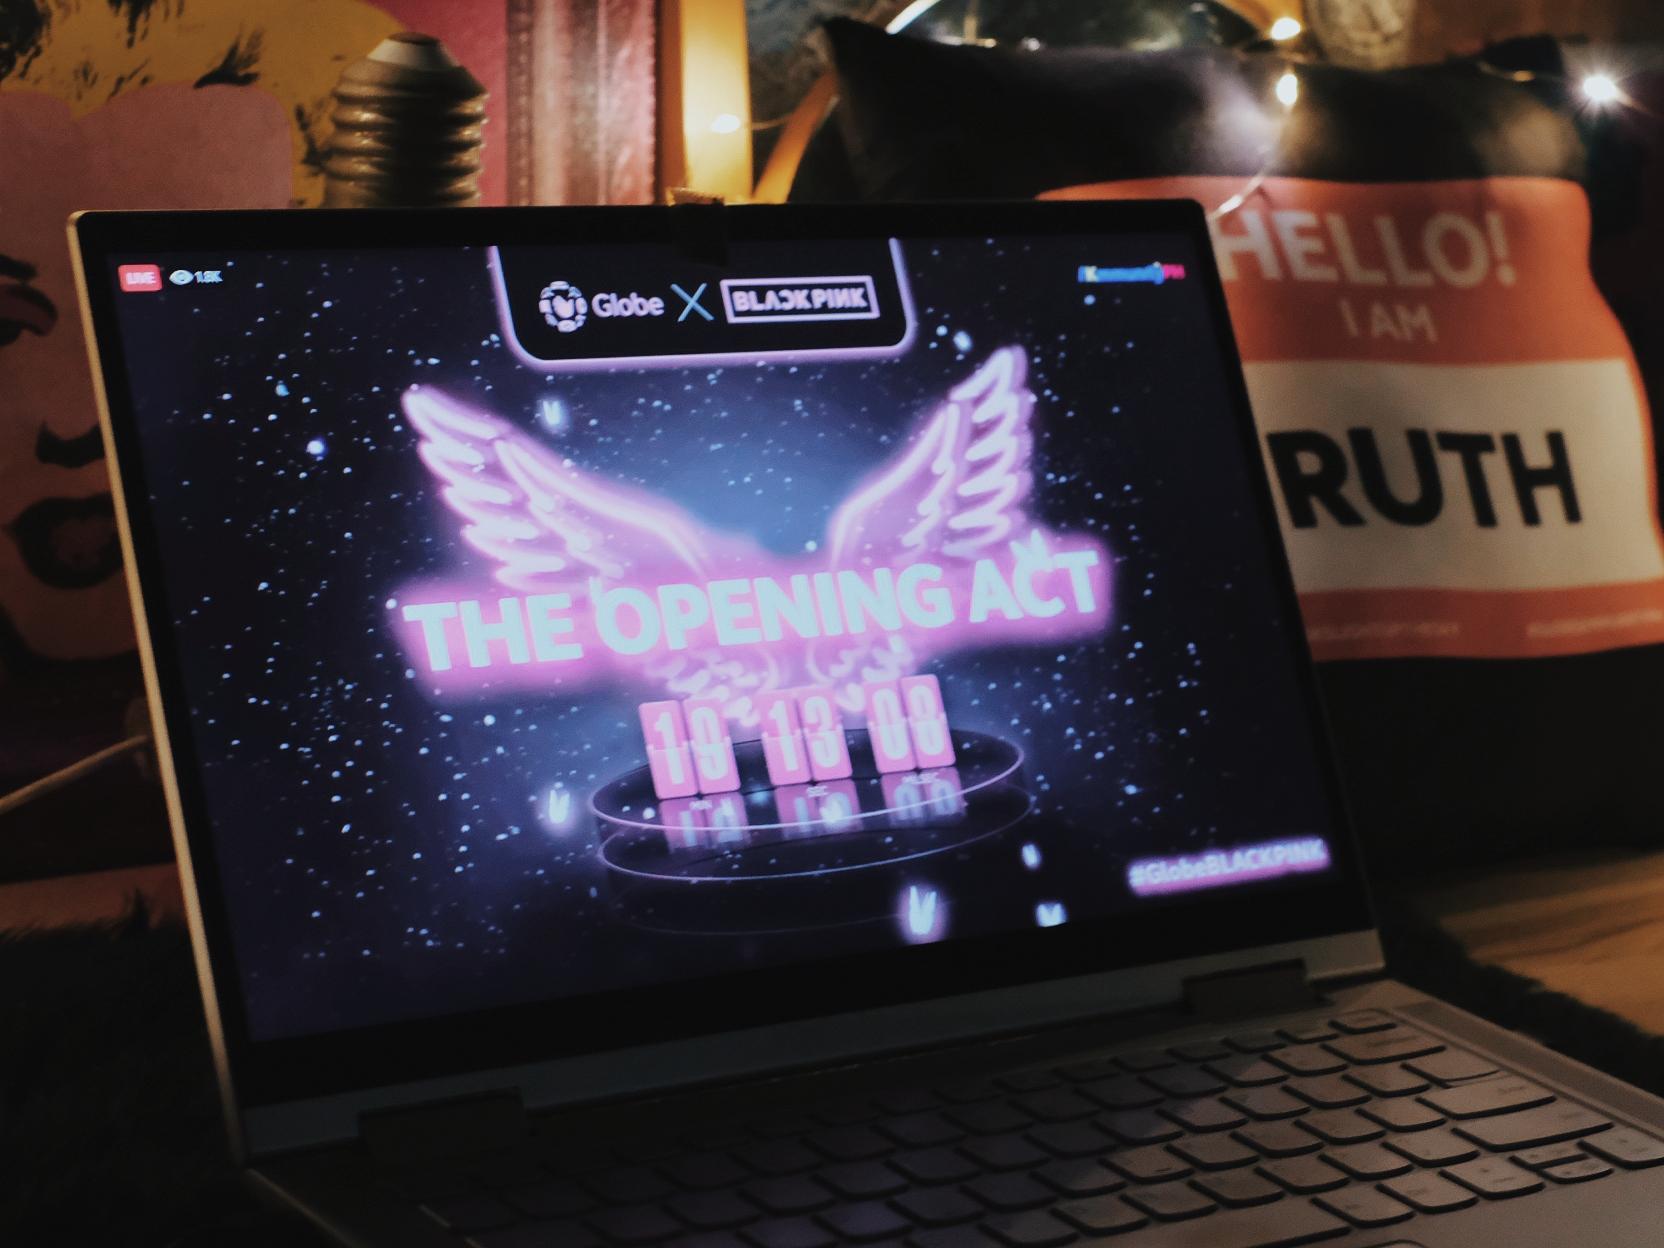 Watch #GlobeBlackPink Reinvented Concert Experience